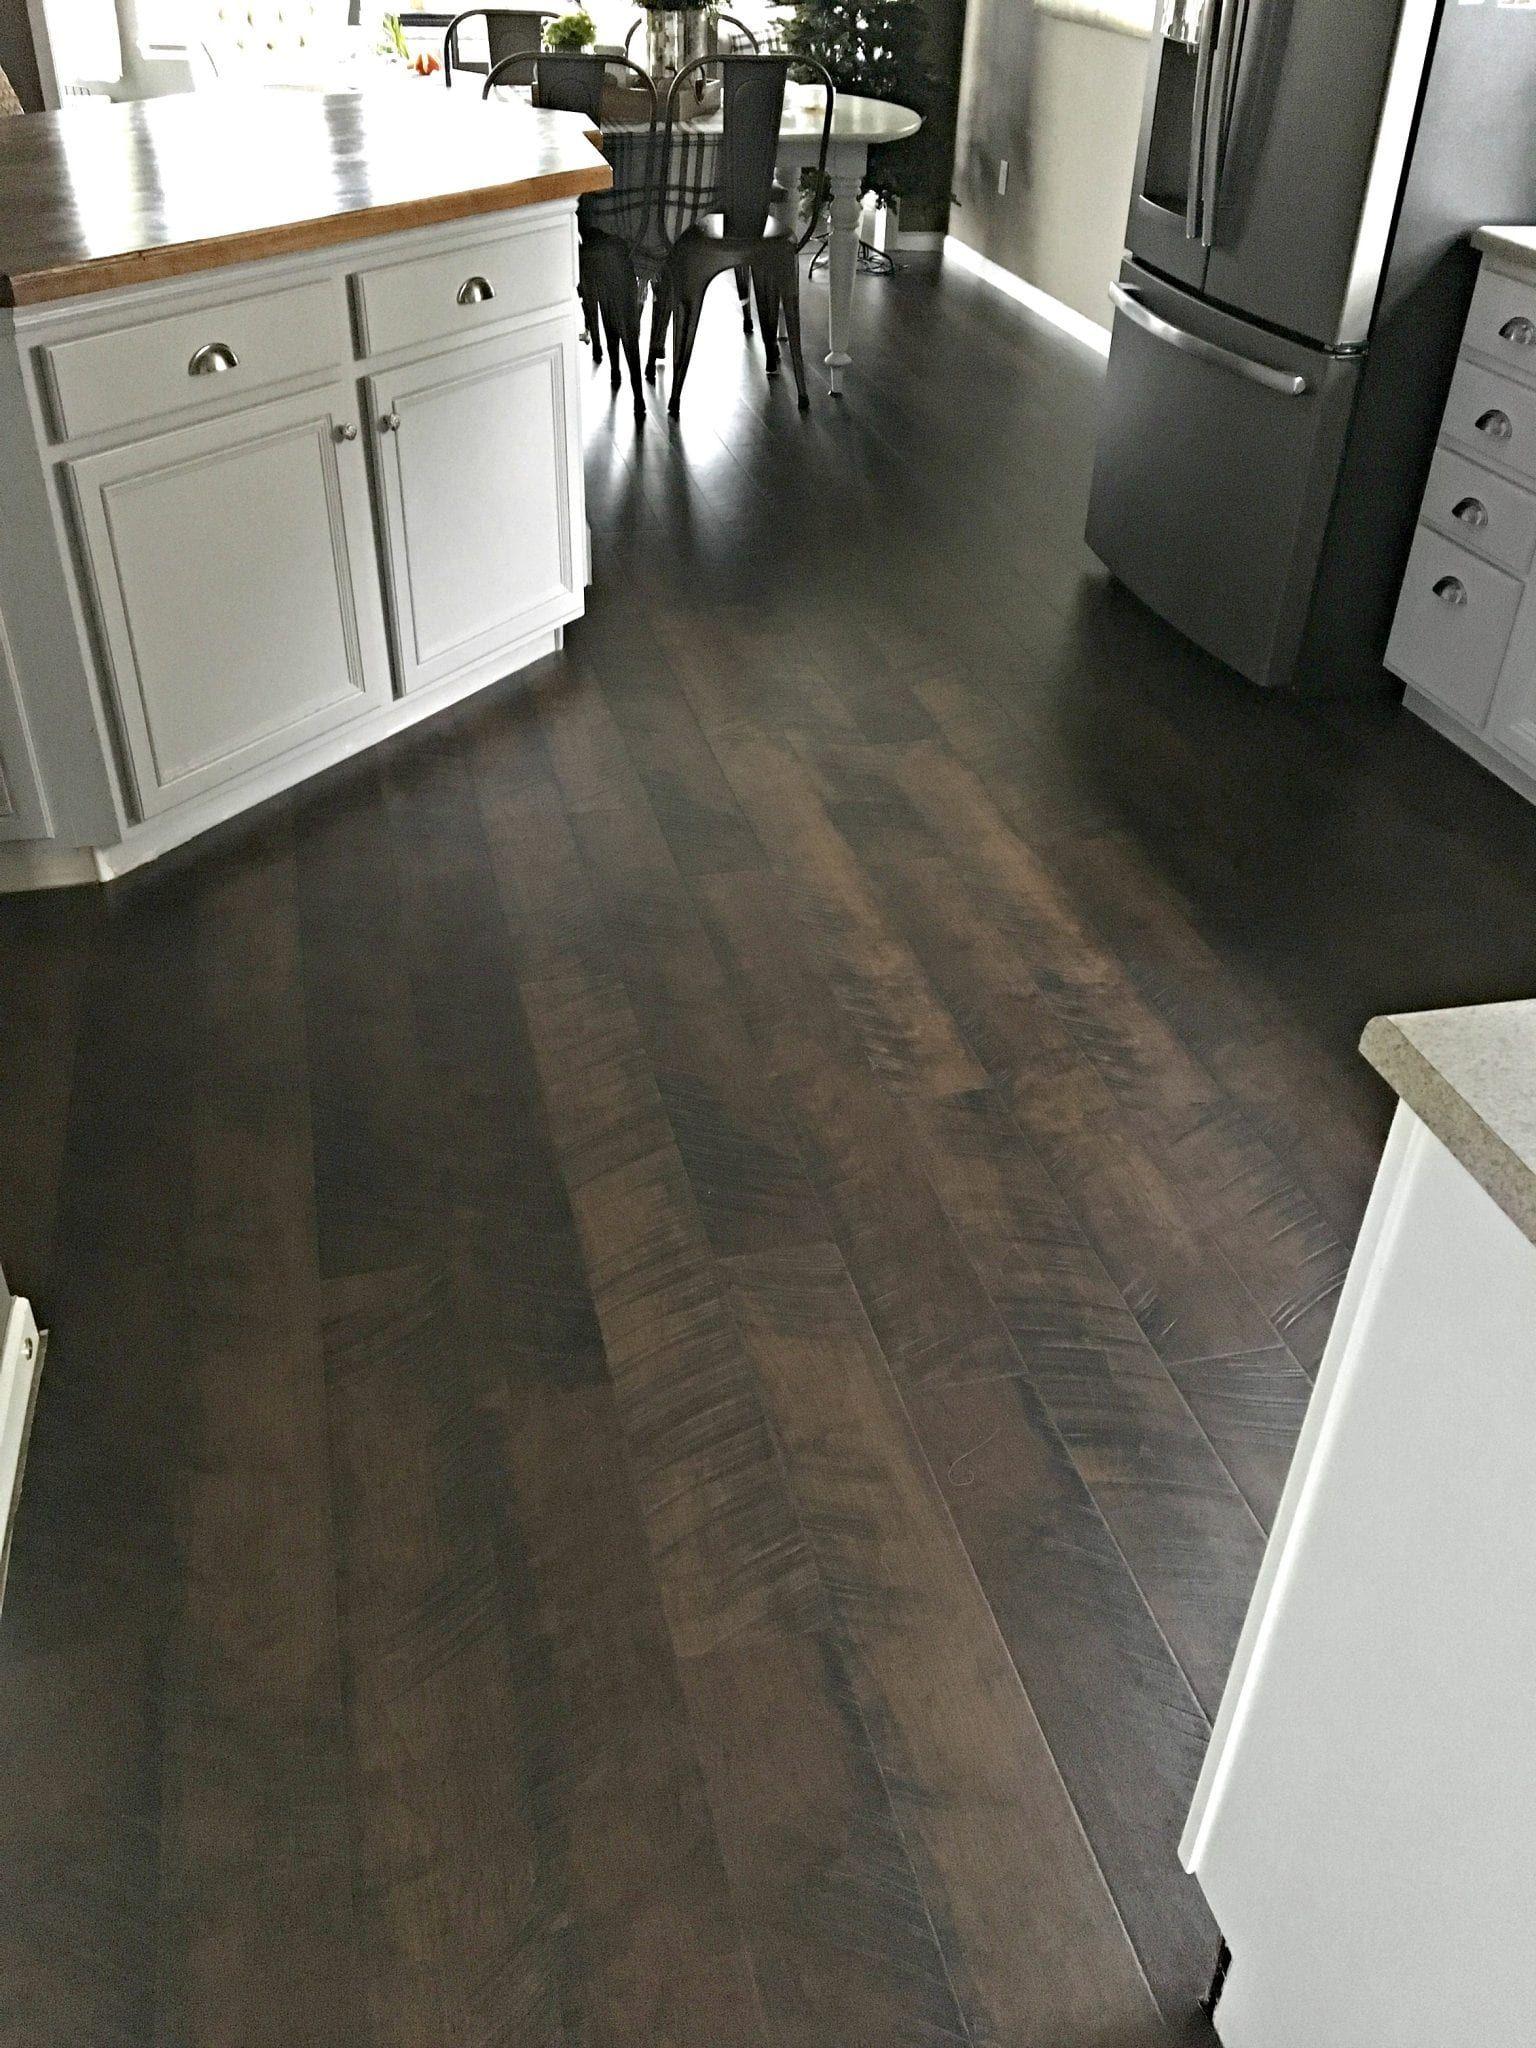 Pergo Flooring Kitchen Reveal With